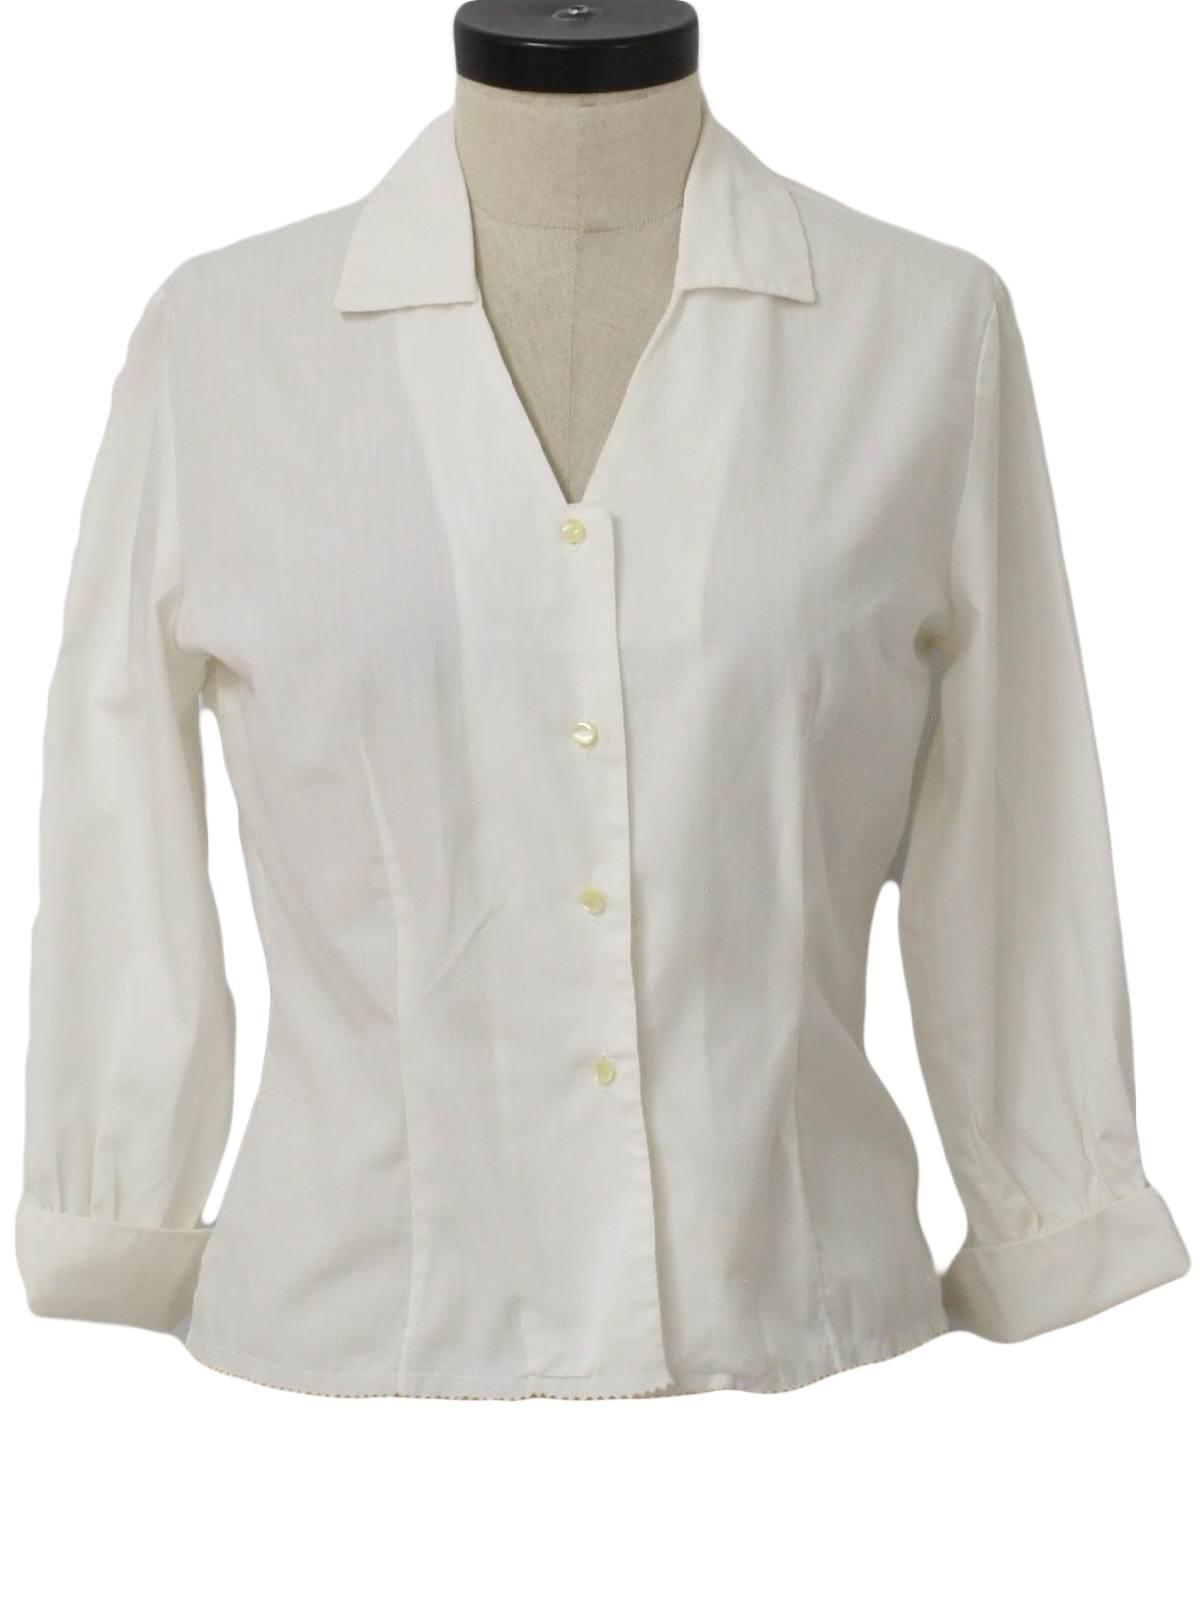 Macshore Classics 60 S Vintage Shirt Early 60s Macshore